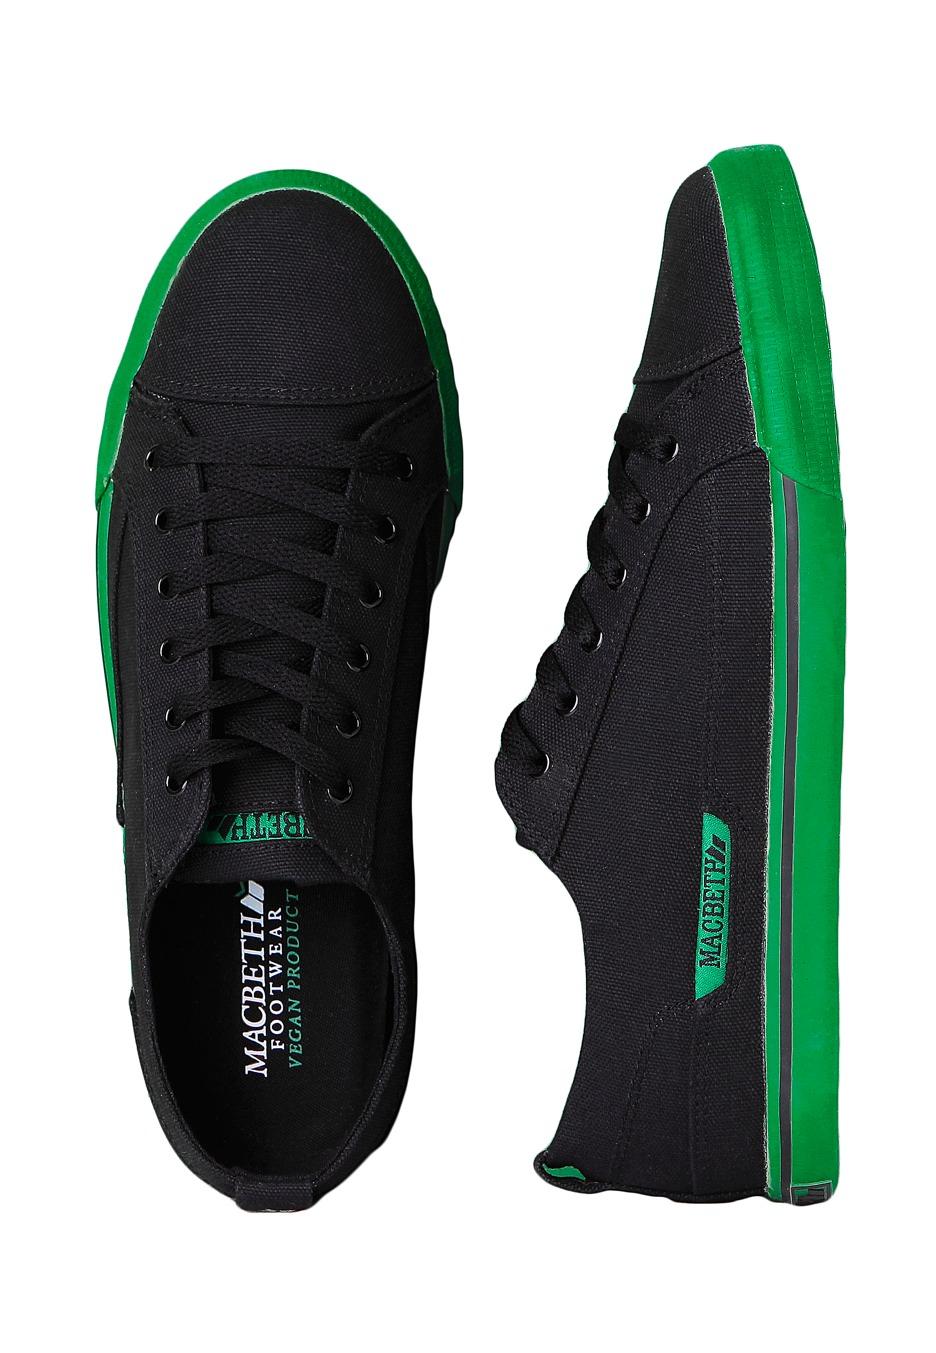 Macbeth Shoes Black And Green